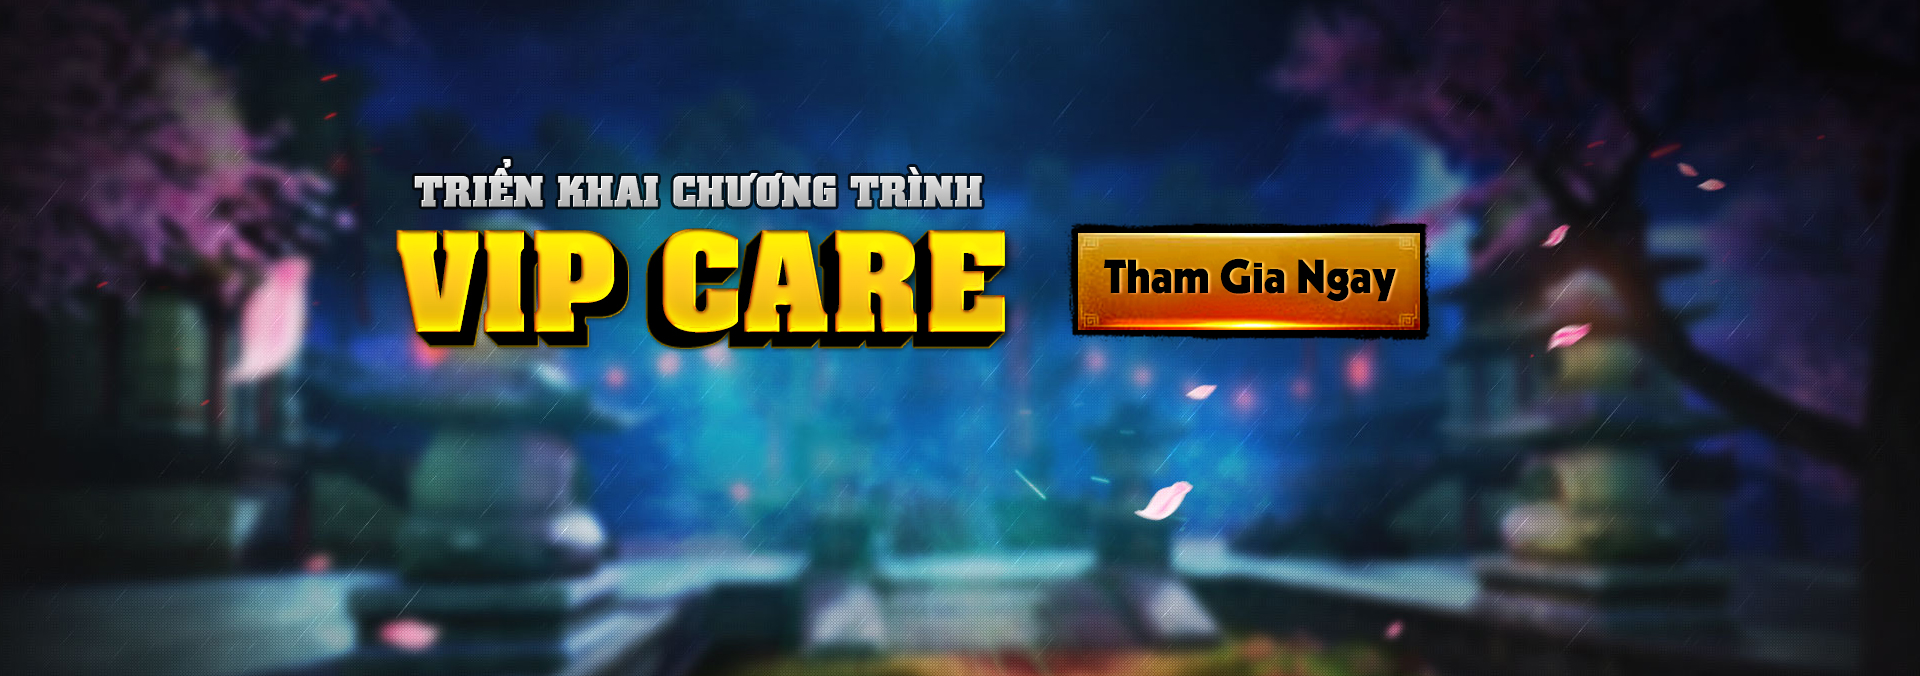 http://daithanhvuong.vn/tin-tuc/vip-chinh-thuc-ramat-chuong-trinh-vipcare-sohagame-997.html